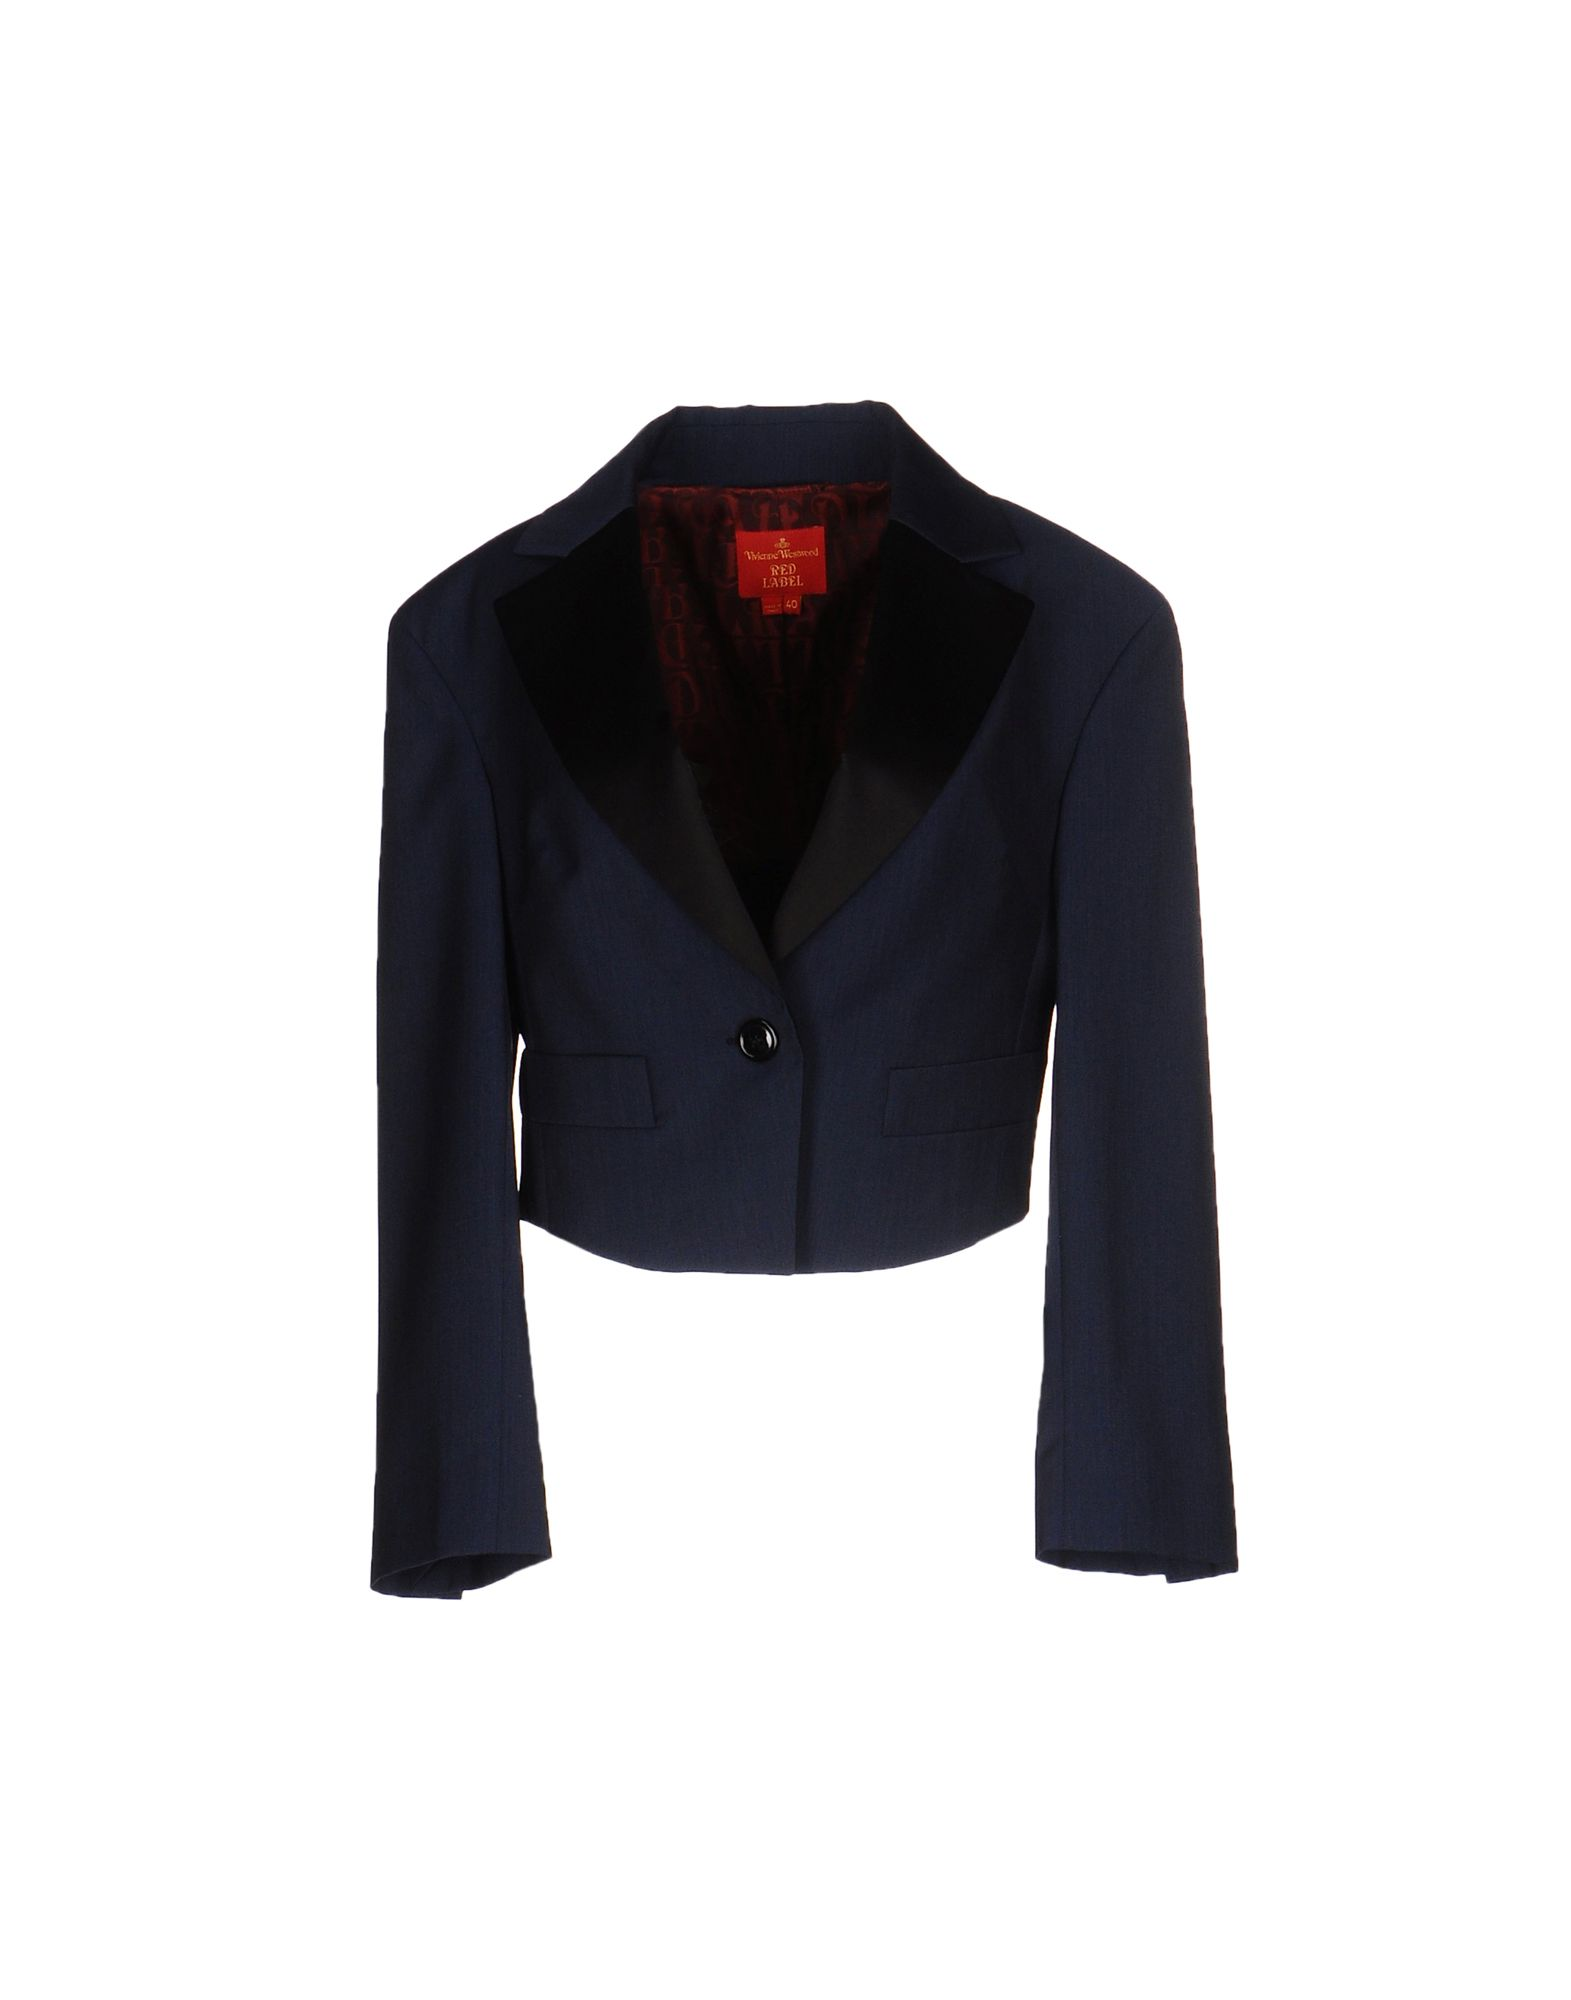 giacca Fiorentina conveniente